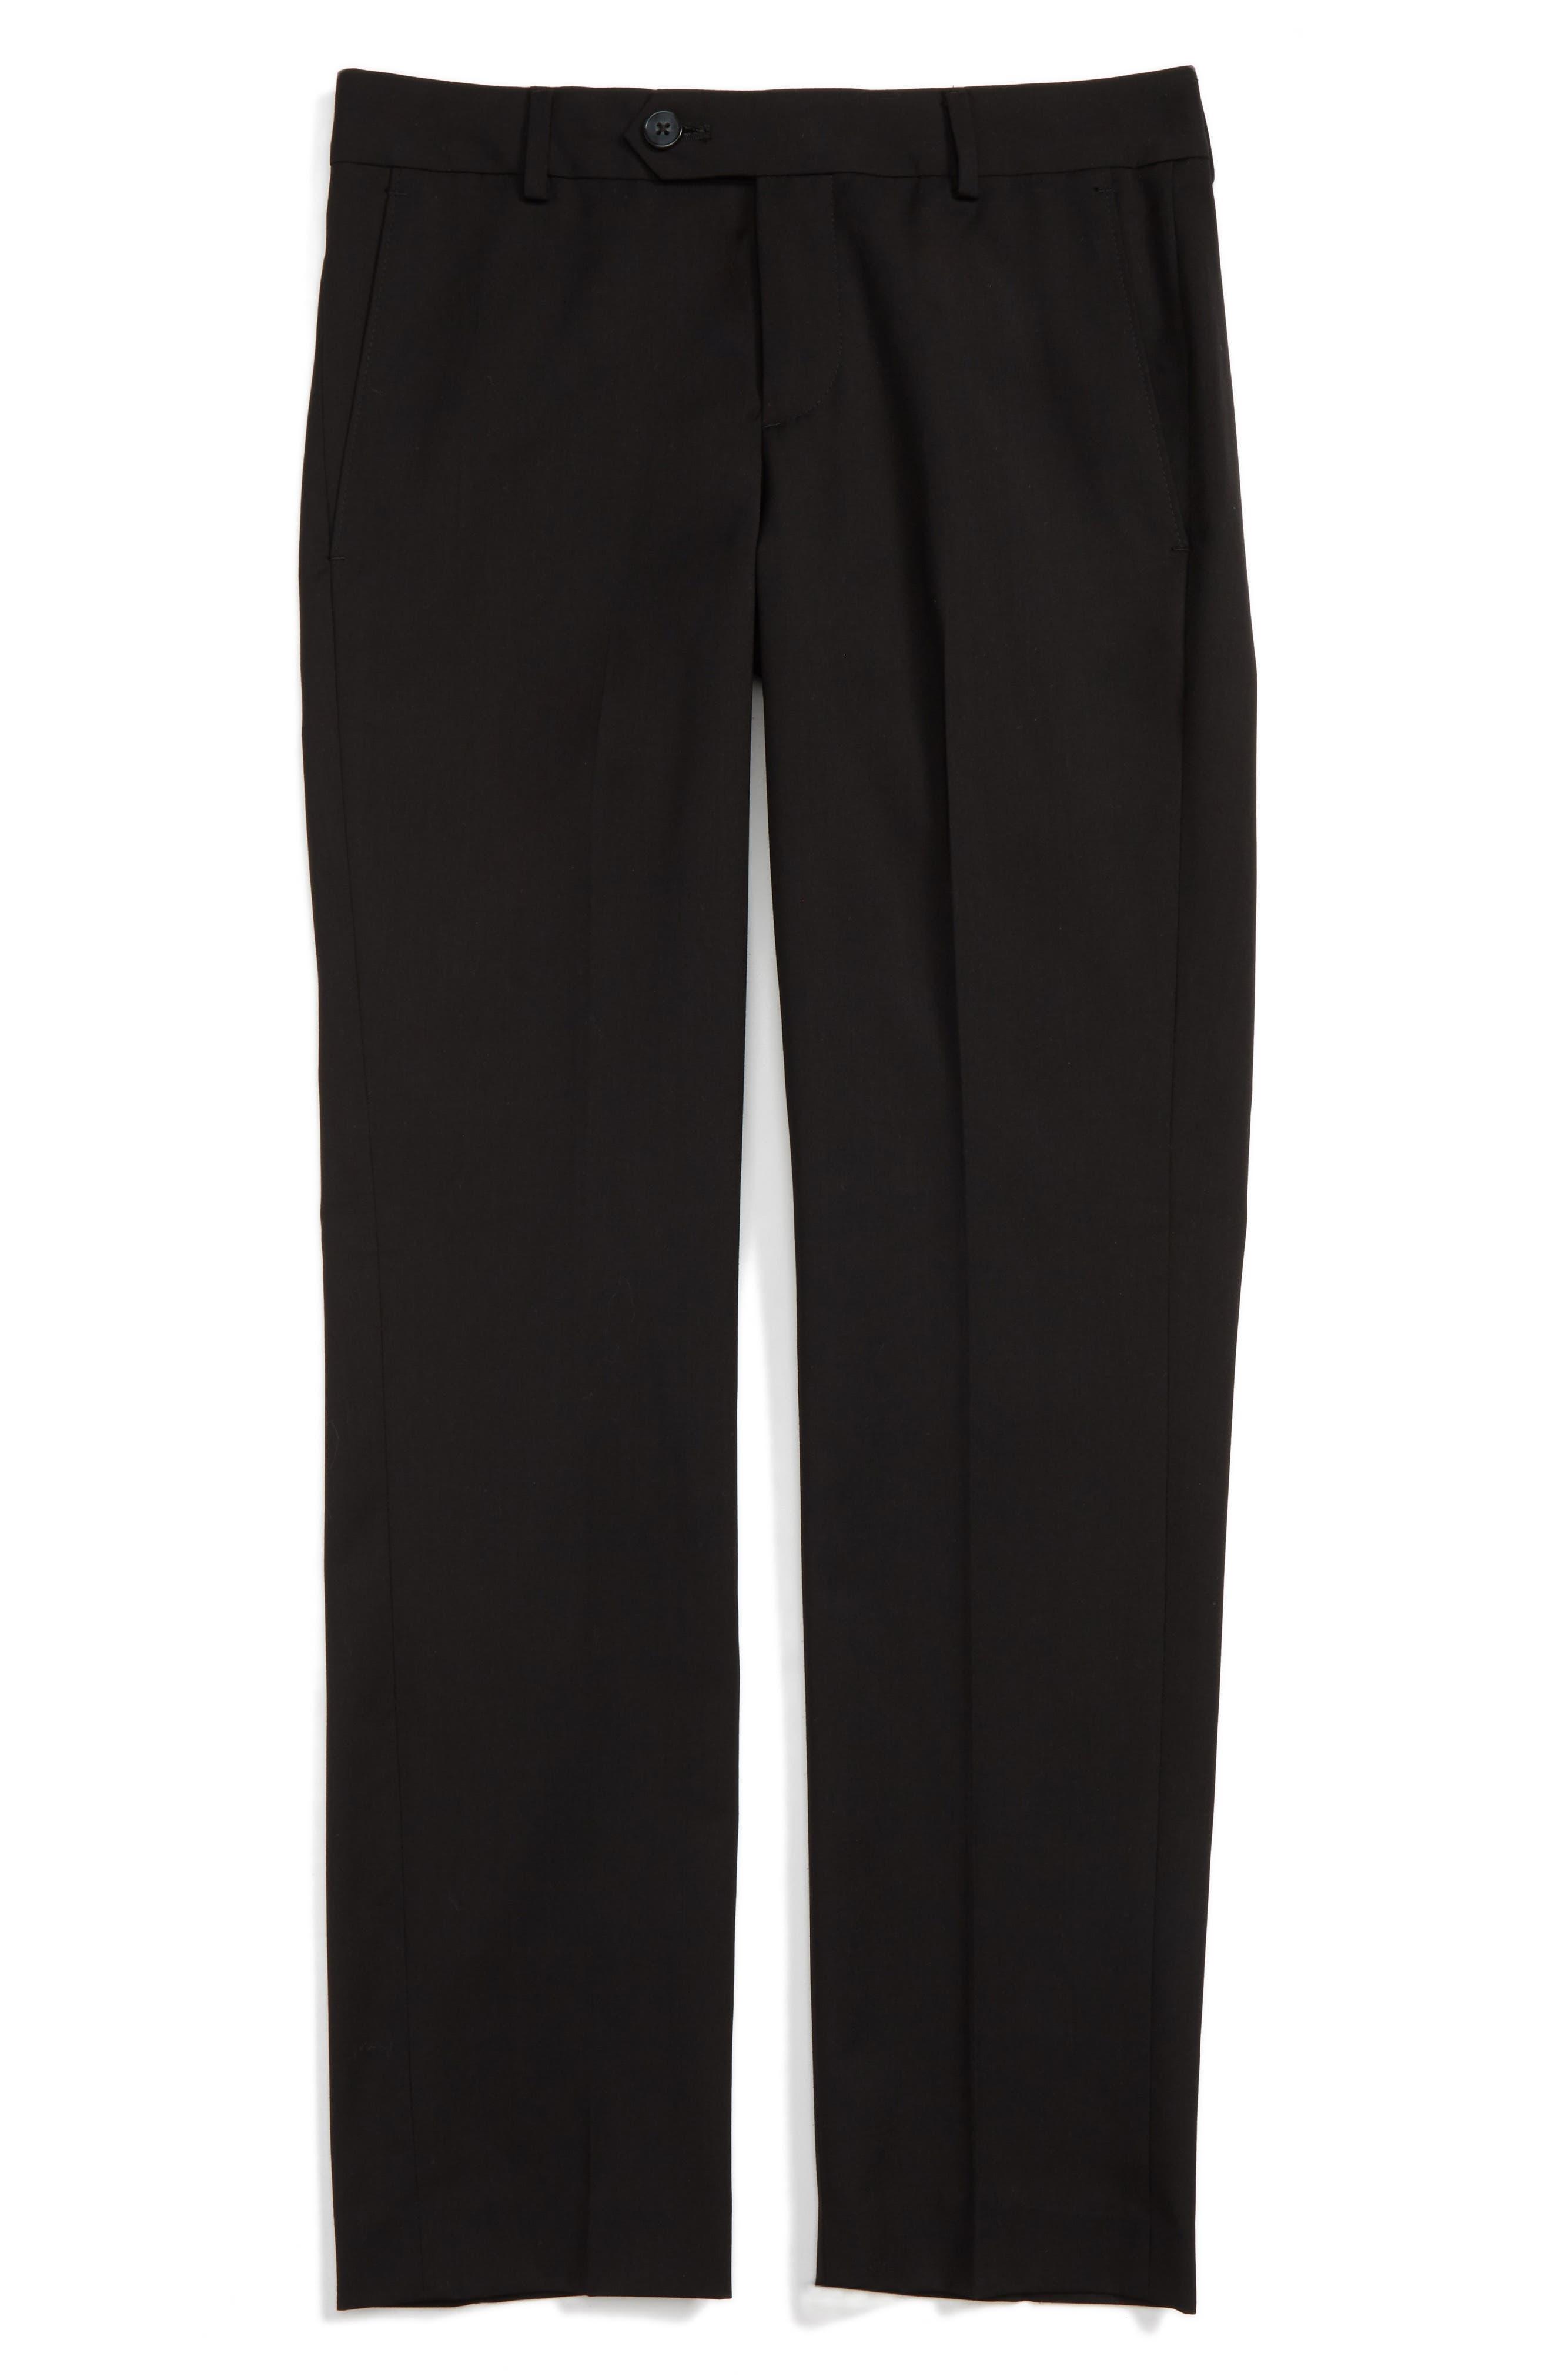 Elliott Slim Fit Flat Front Trousers,                             Main thumbnail 1, color,                             BLACK